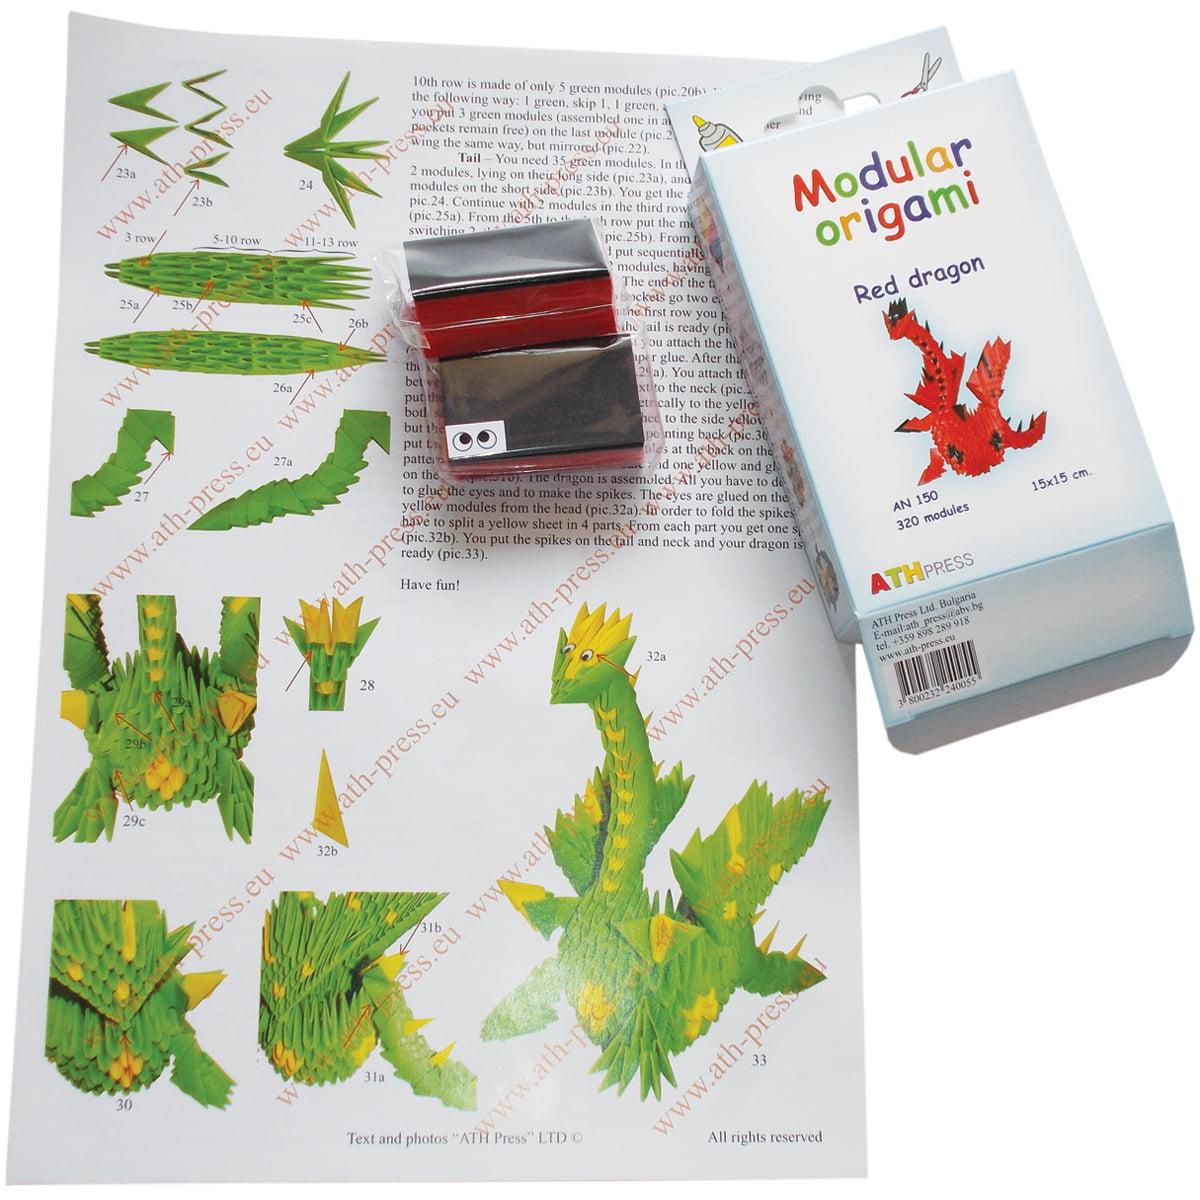 Modular Origami Kit-Red Dragon - image 1 de 1